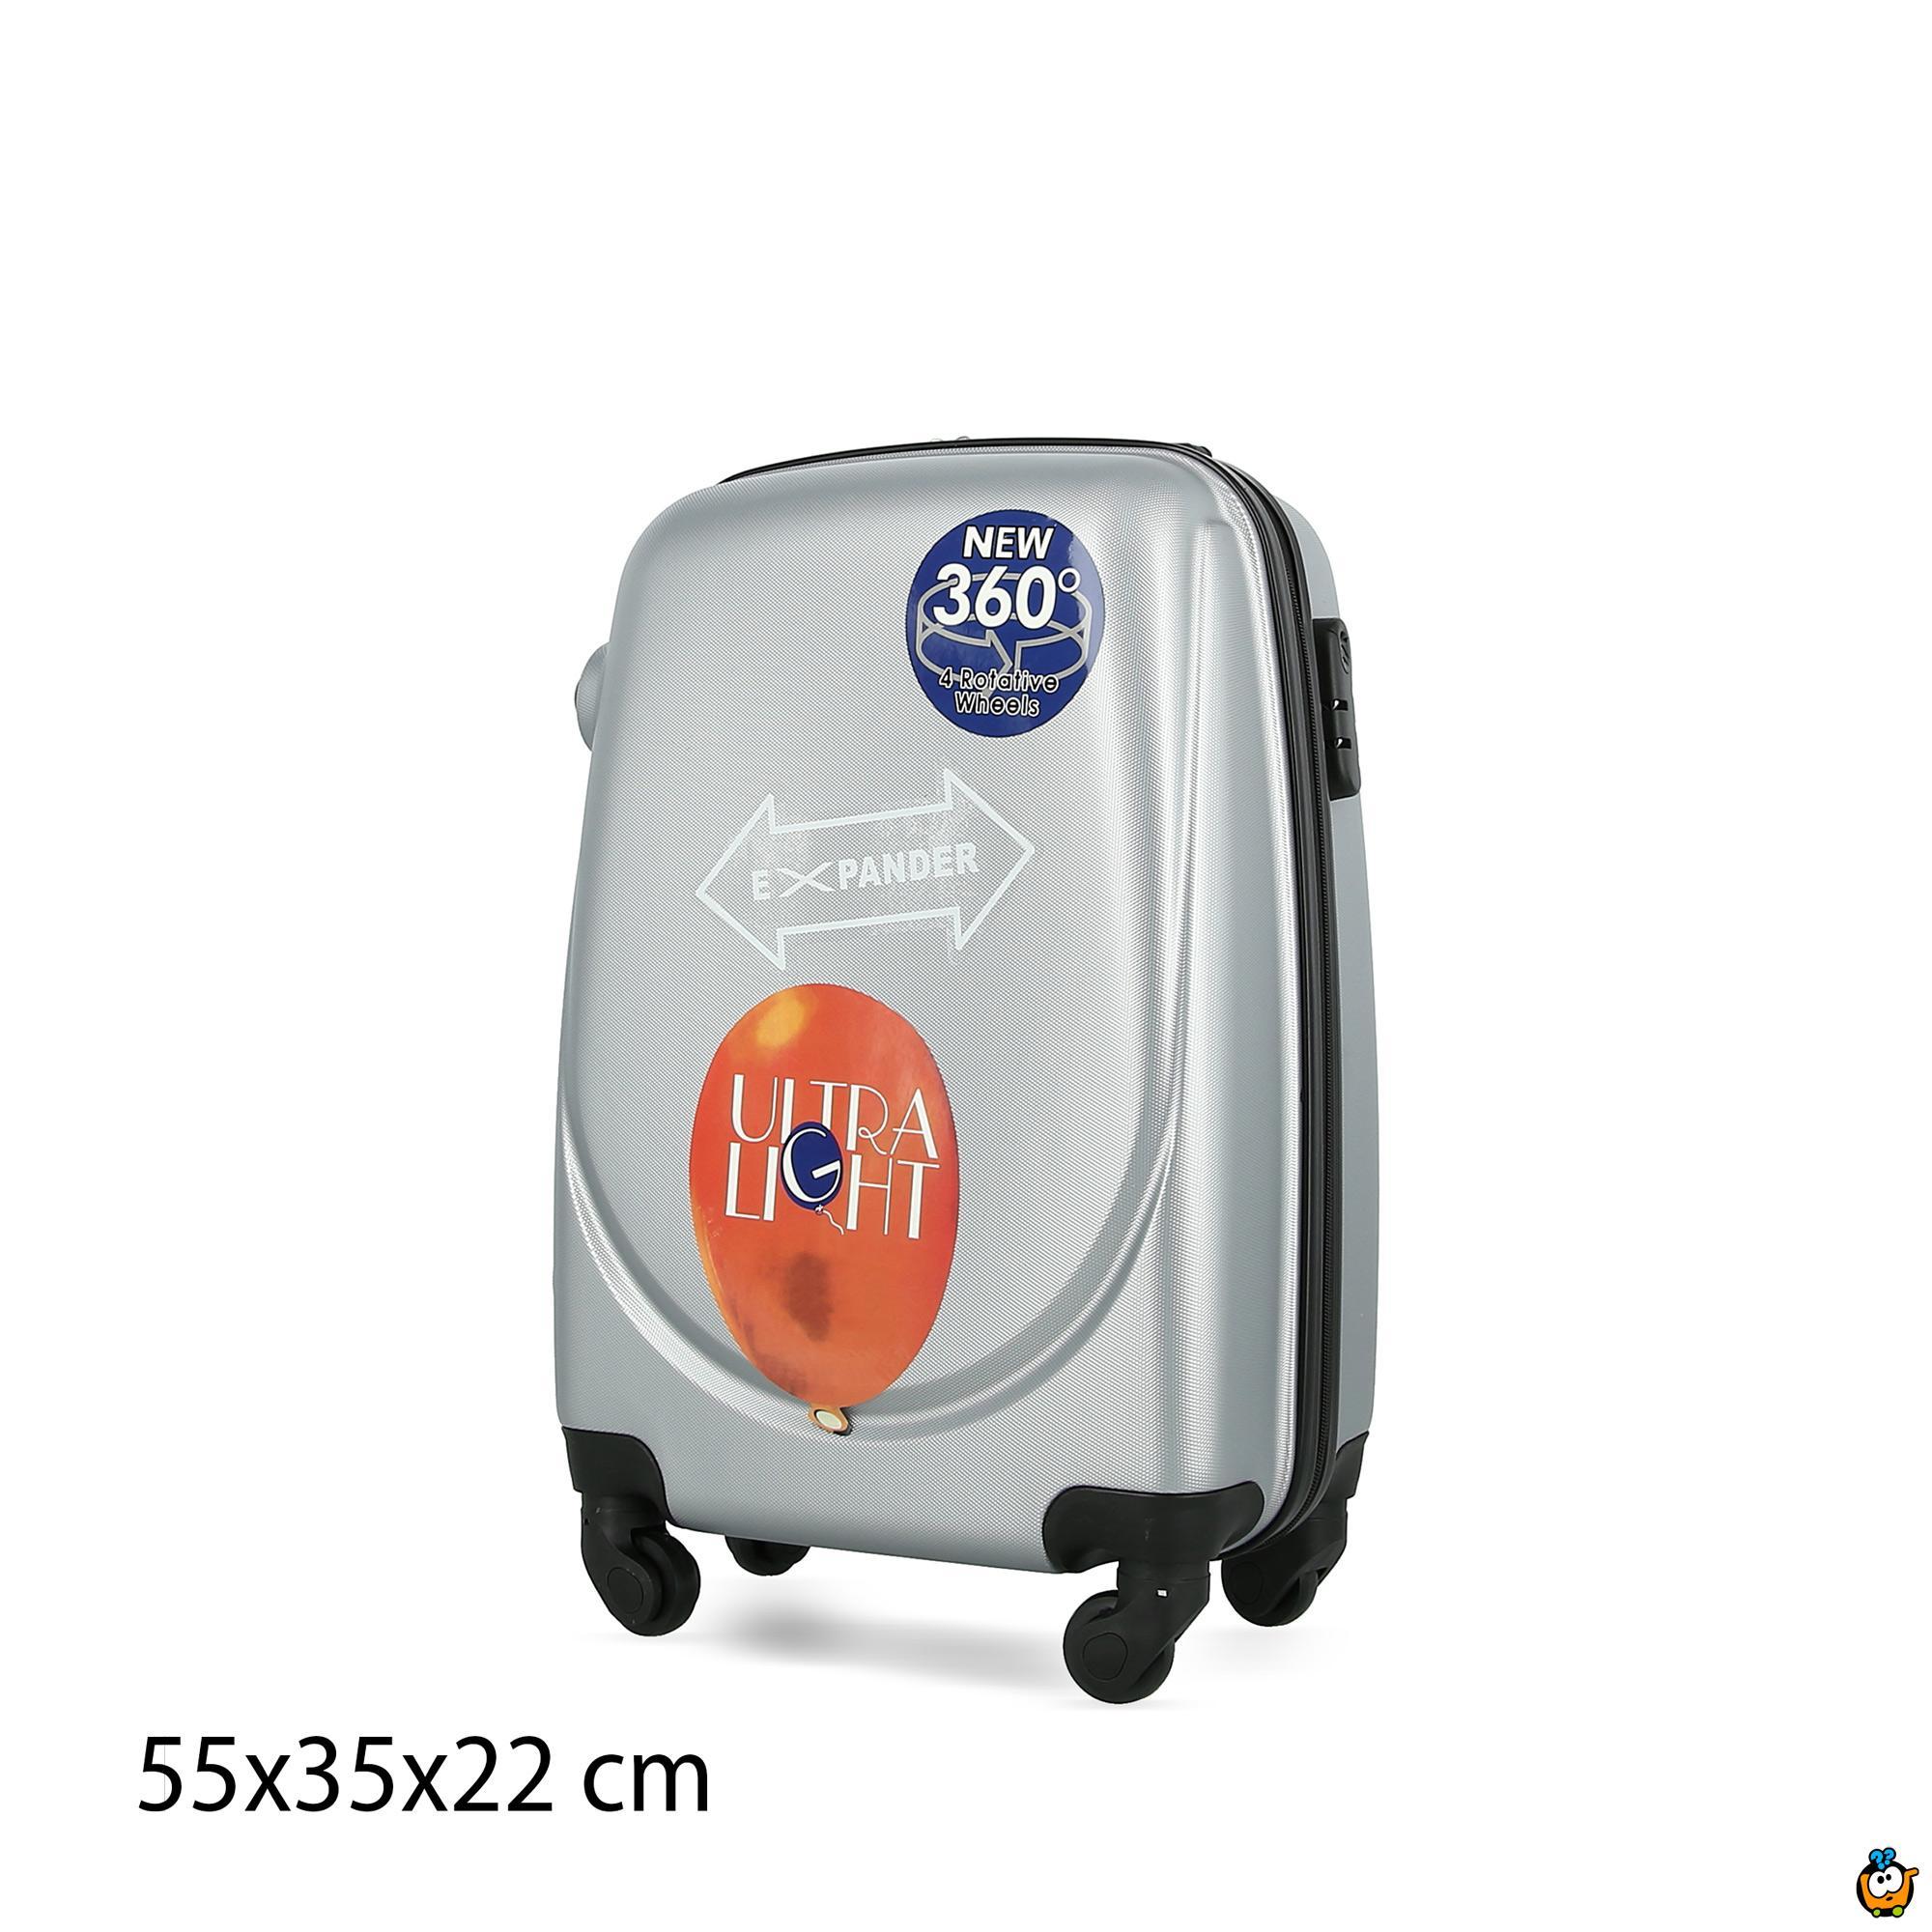 Putni kofer Expandable sa točkićima 360° -  SIVI M